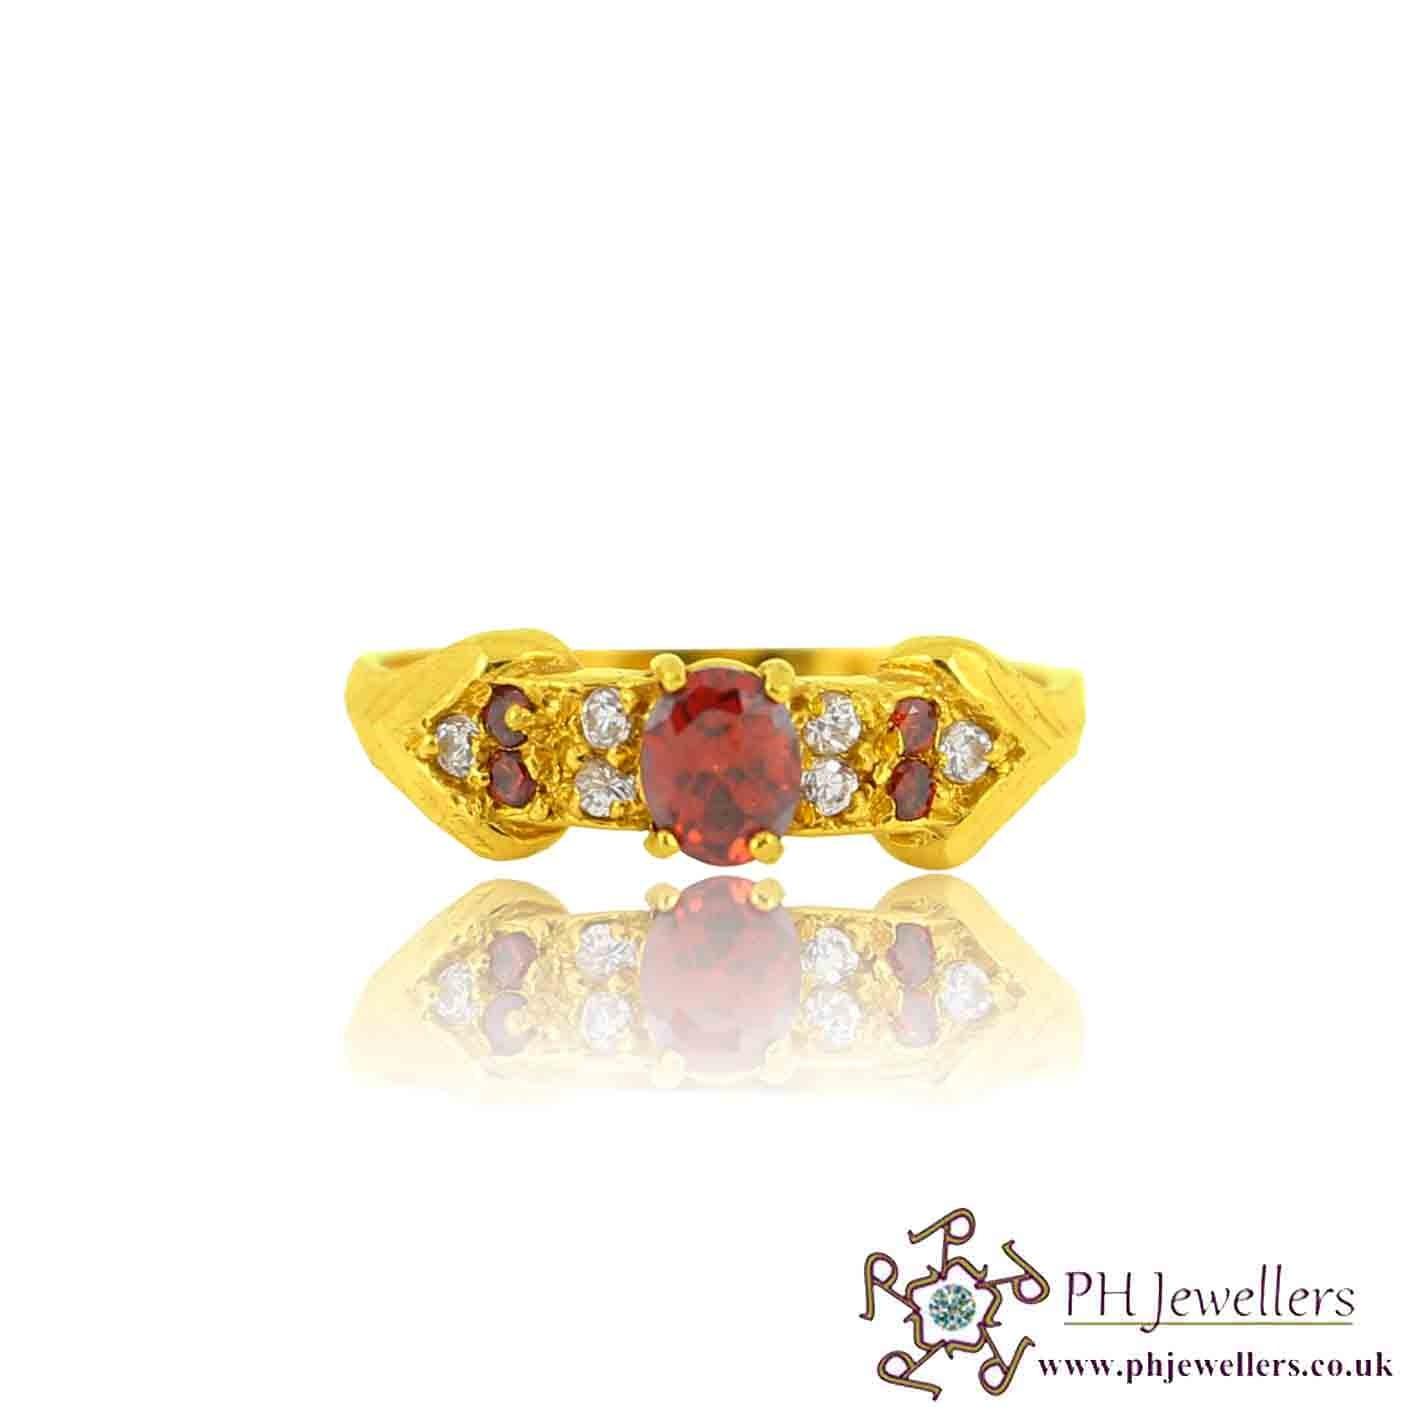 22ct 916 Yellow Gold Hallmark  Garnet Ring CZ Size N,O SR118